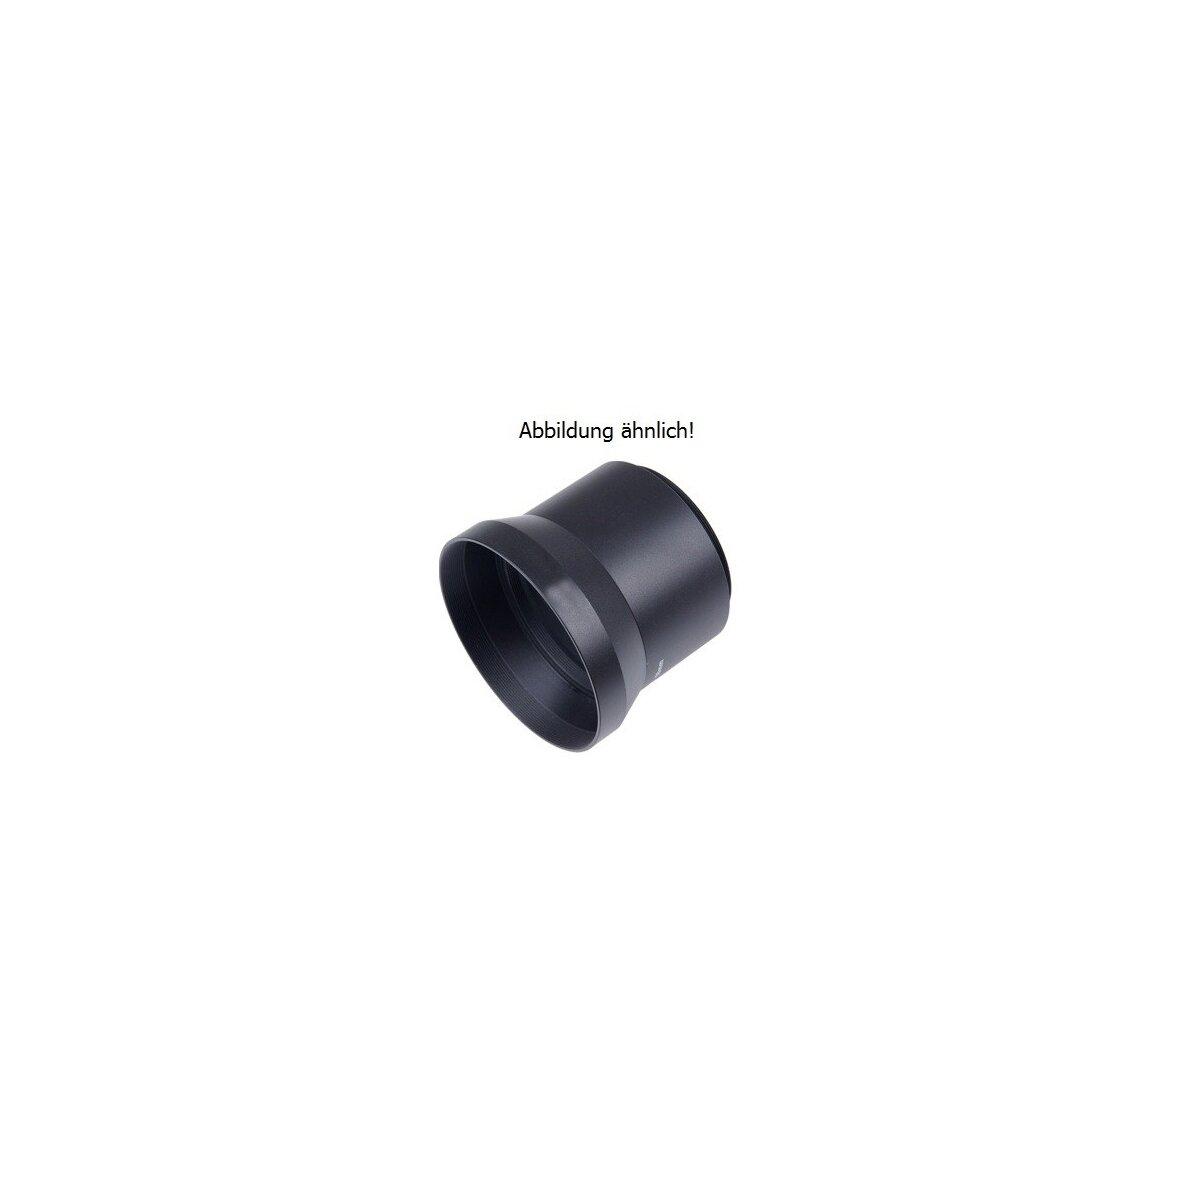 Adapter Tubus fuer Kodak Z730 mit 52mm